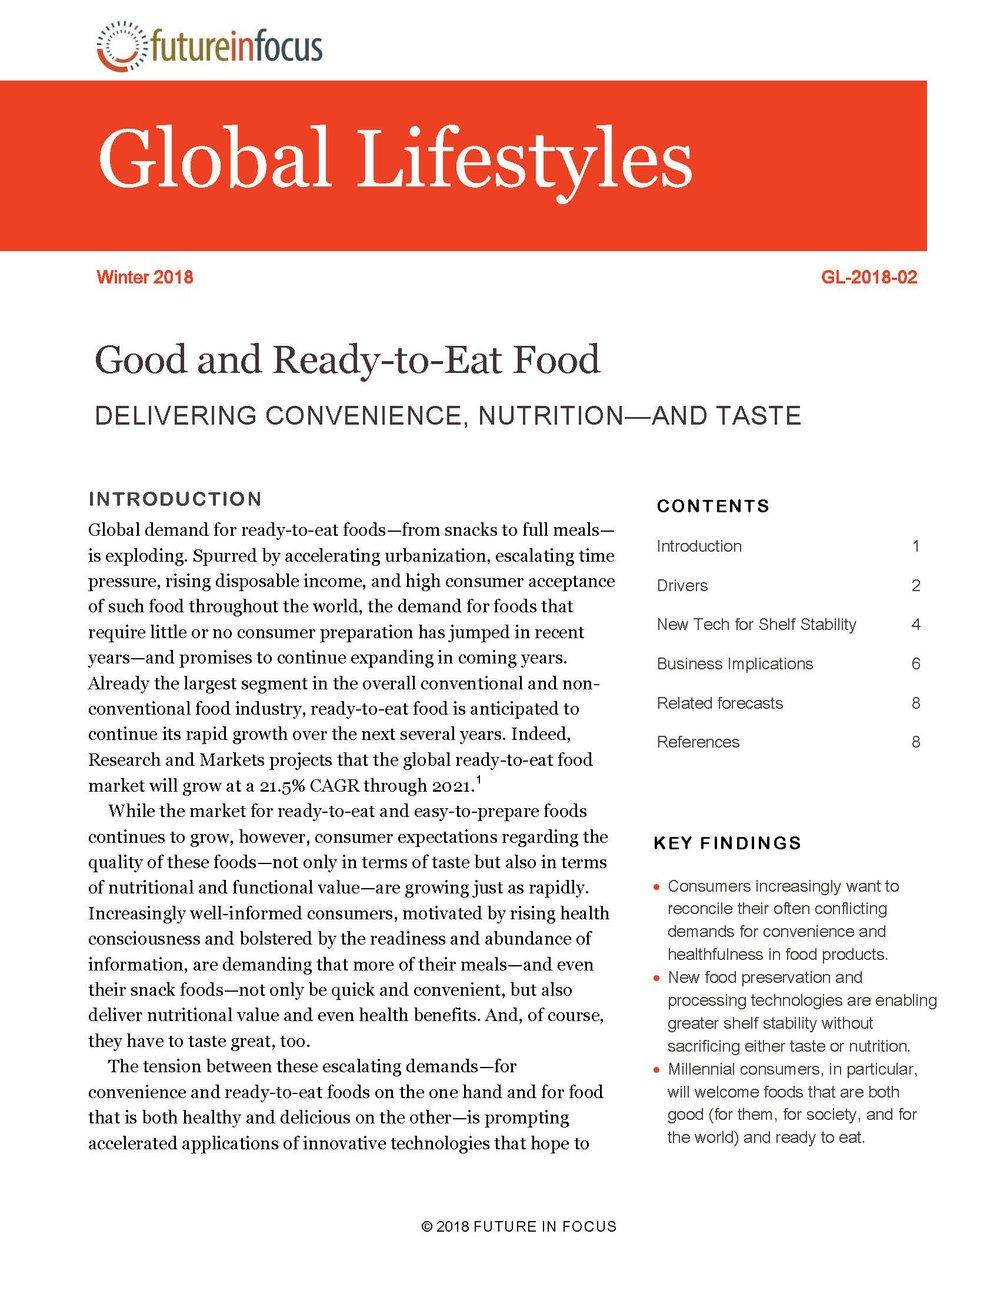 GlobalLifestyles.jpg